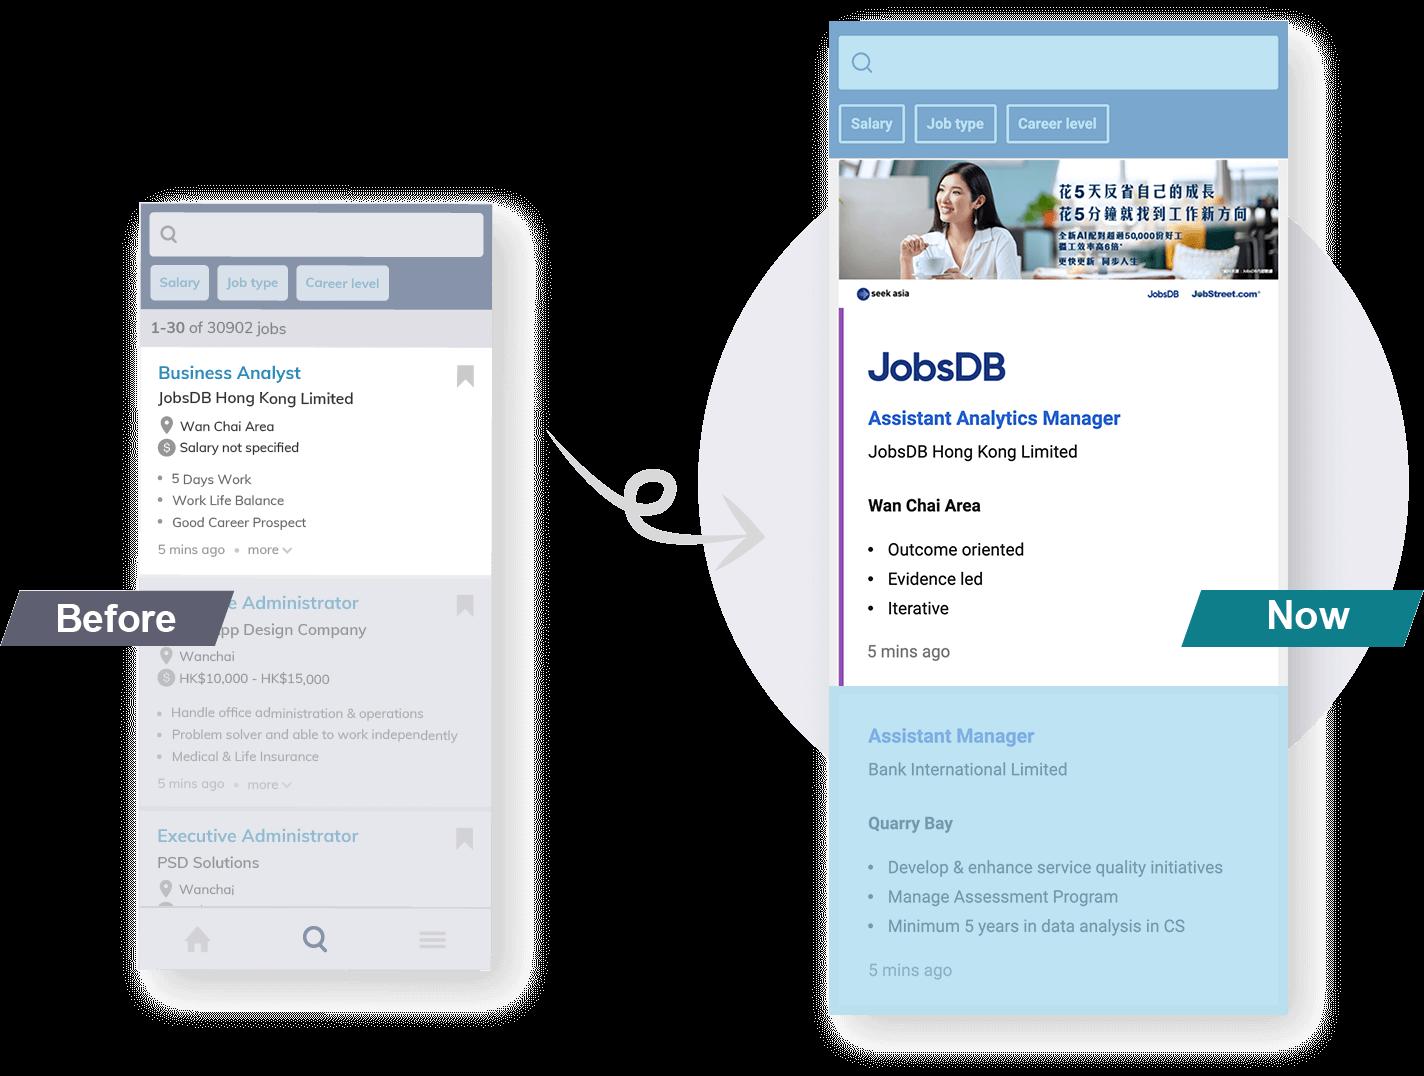 jobsDB brandedAD+ features